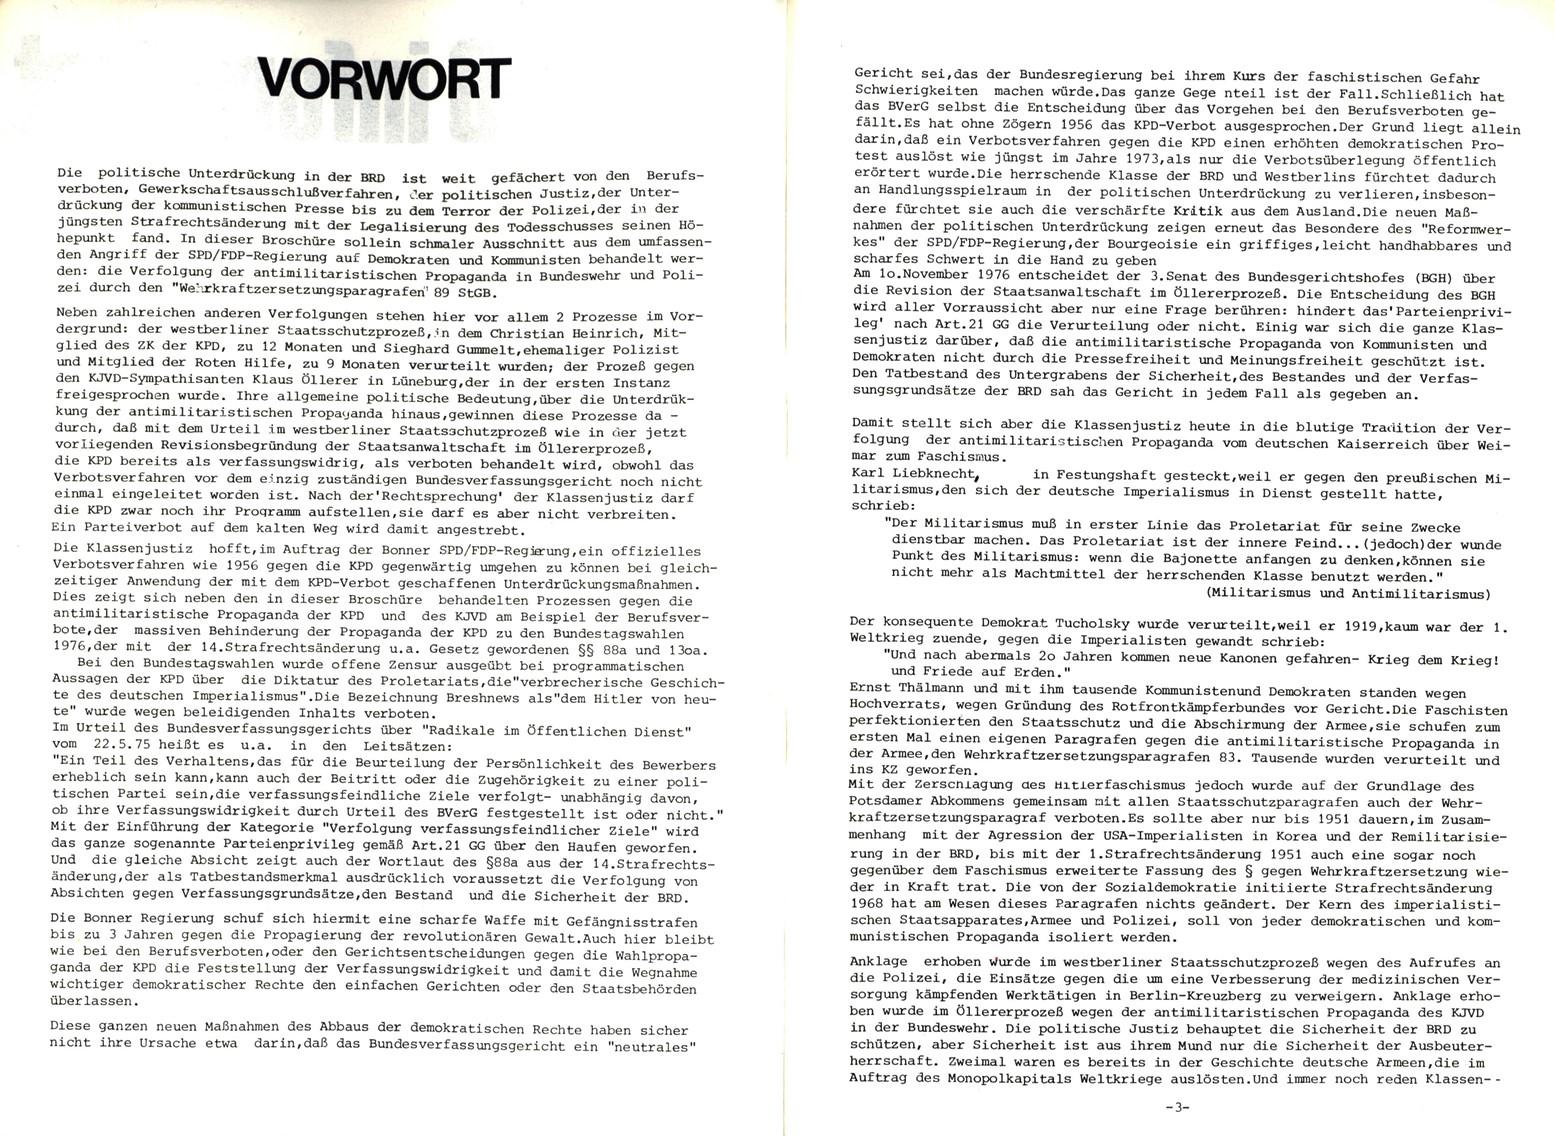 KPDAO_1976_Staatsschutzparagrafen_02